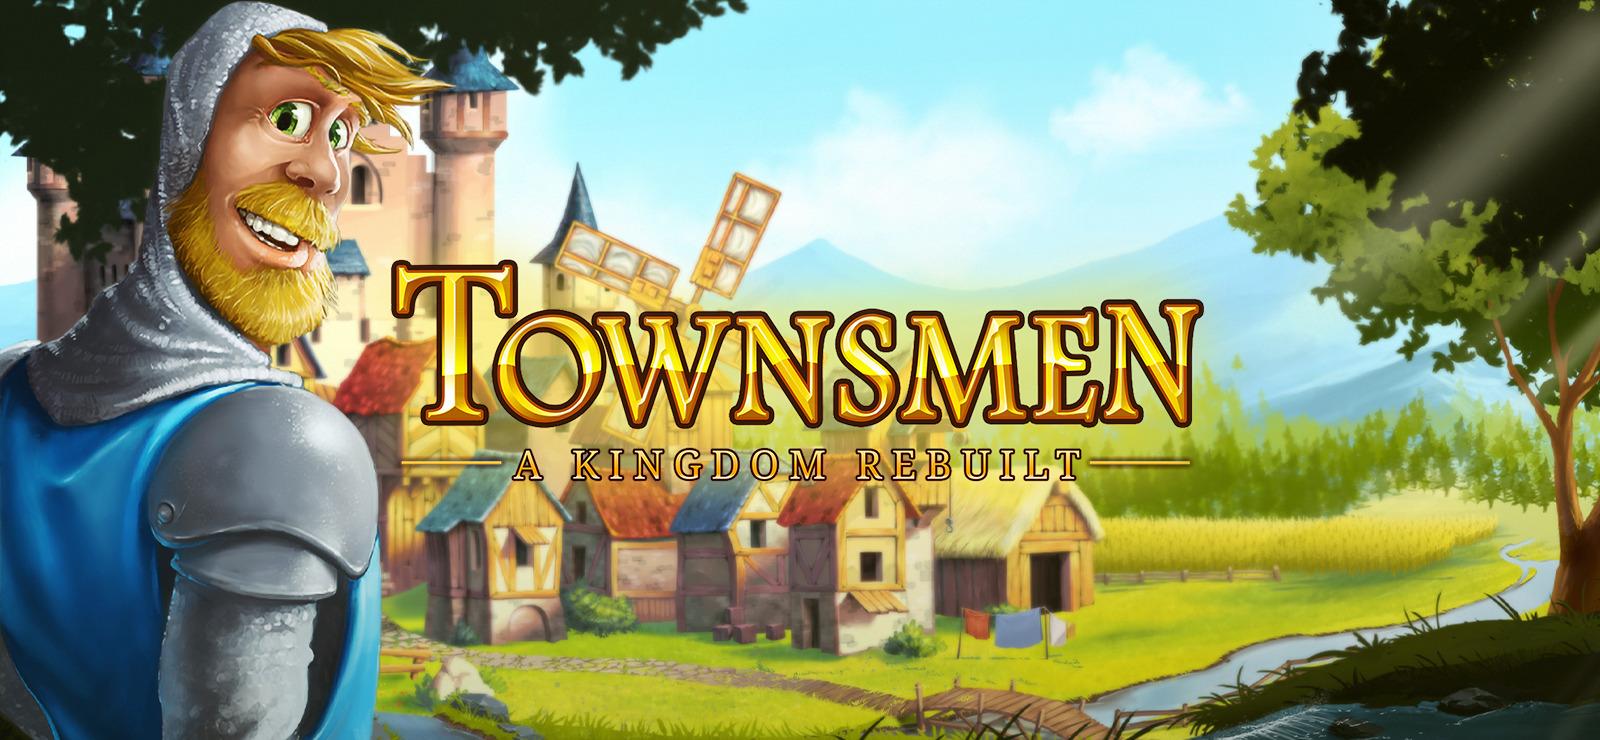 Townsmen A Kingdom Rebuilt Complete Edition-GOG